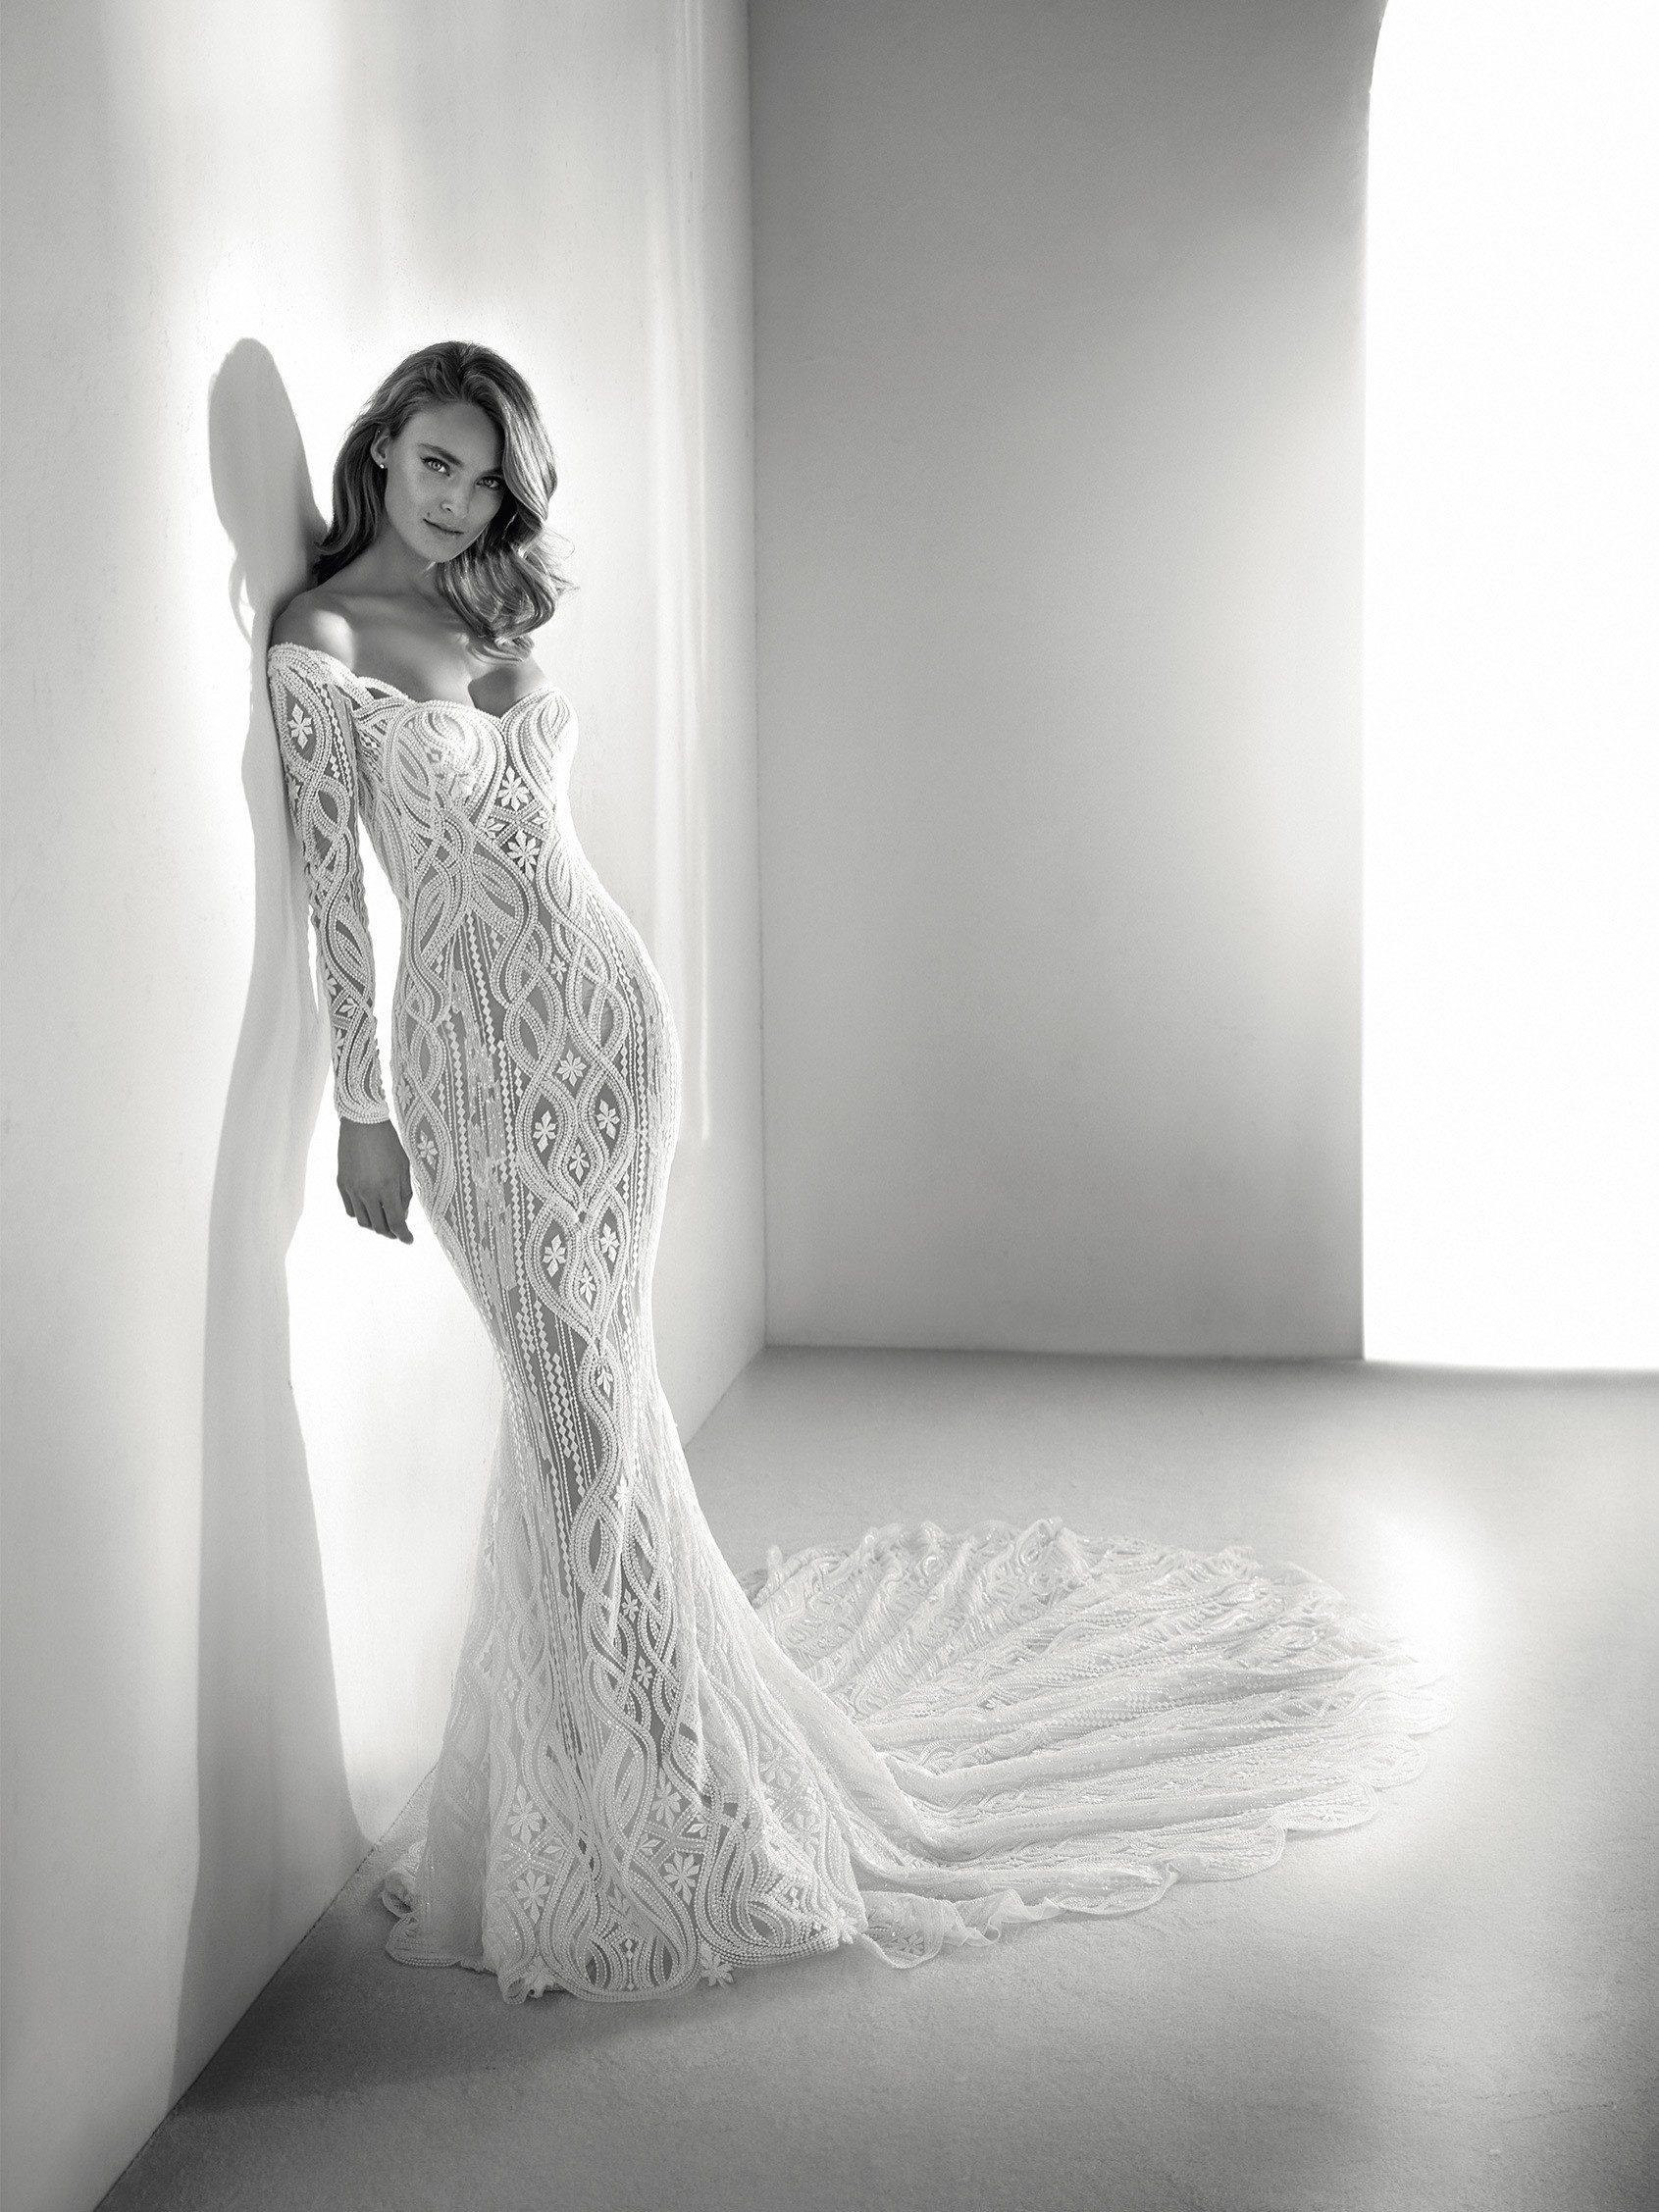 Mira Couture Atelier Pronovias Royal Wedding Gown Bridal Dress Chicago Boutique Front